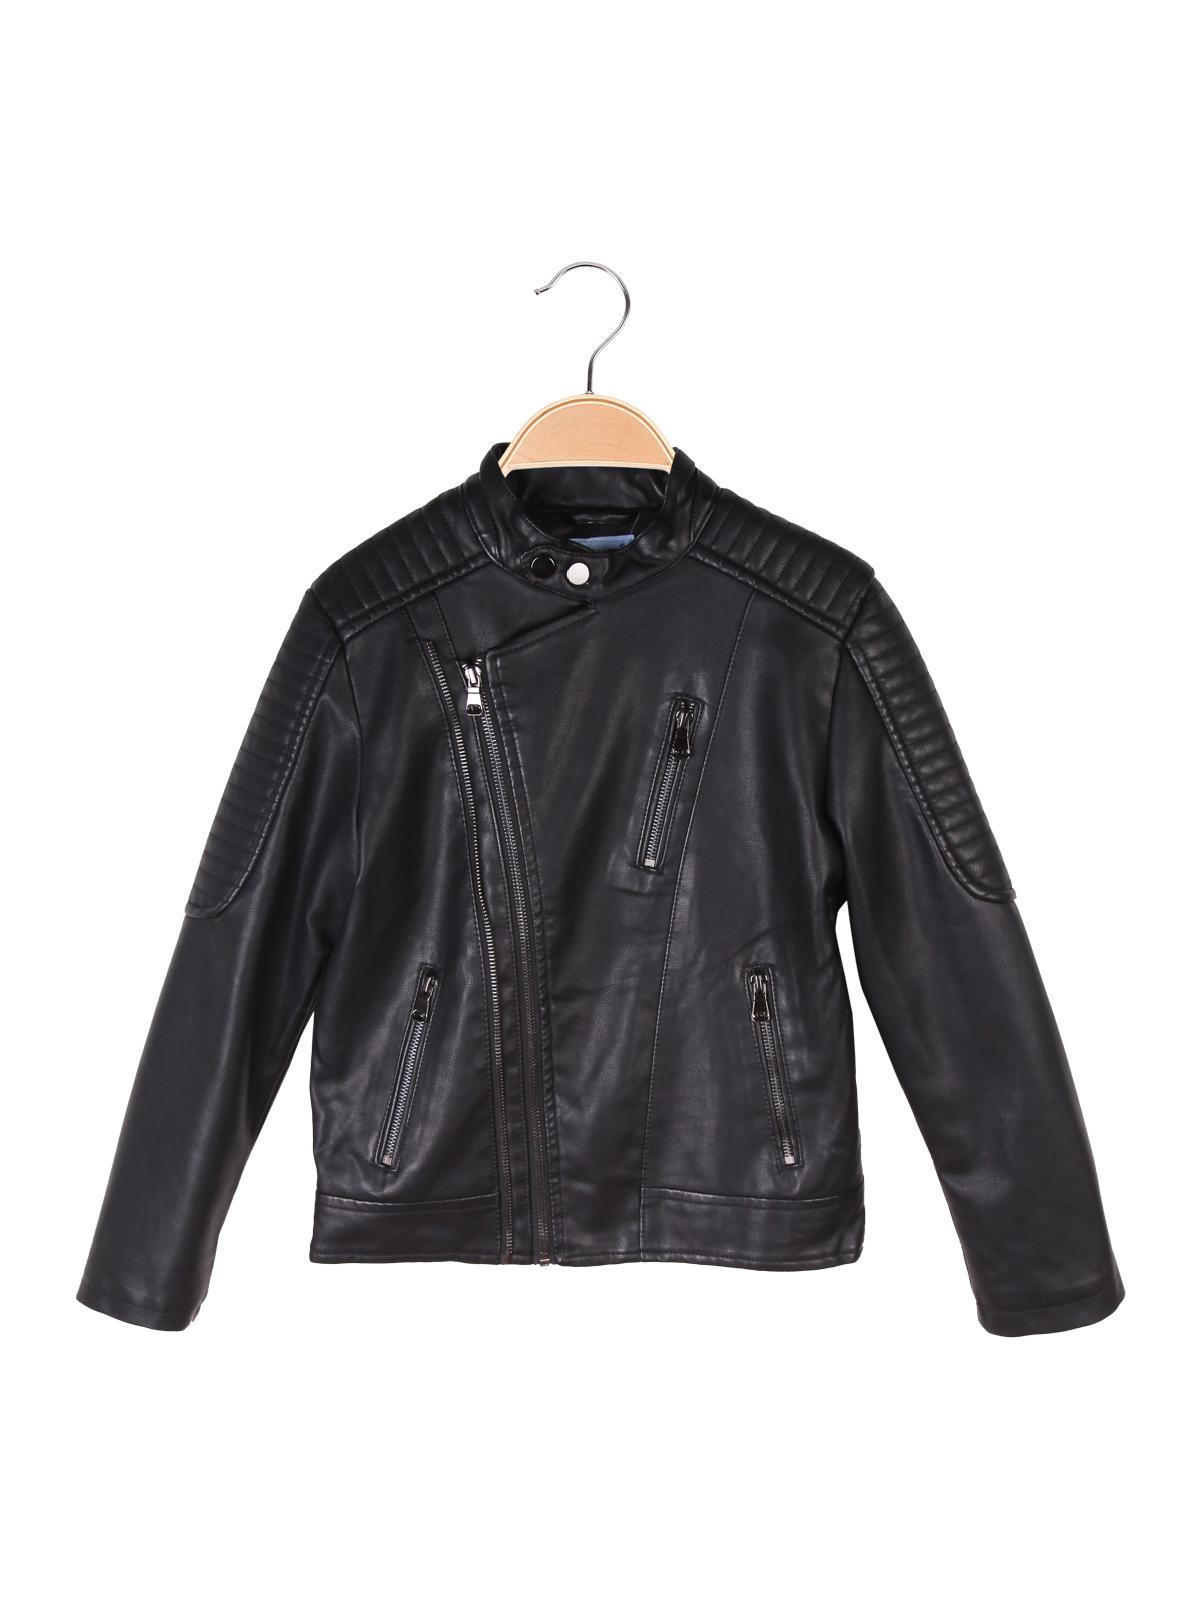 sale retailer b377e 85233 Giacca di pelle - black ativo | MecShopping